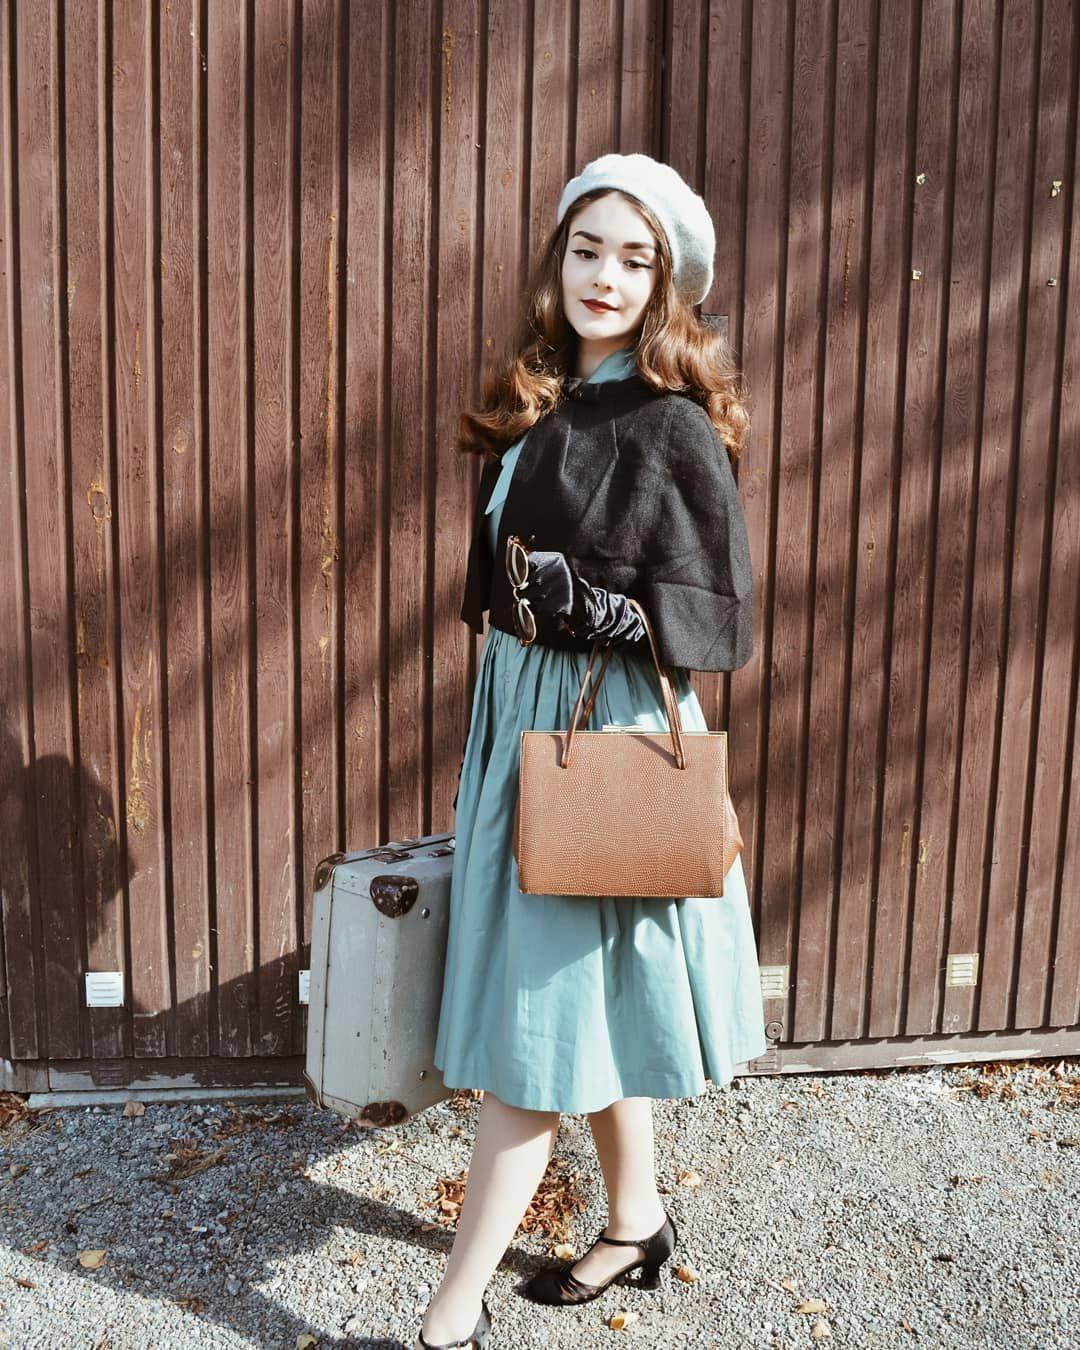 Shirinatra Looks Beautiful Rocking This Stunning Vintage Look Vintage Inspired Fashion Retro Fashion Girly Fashion